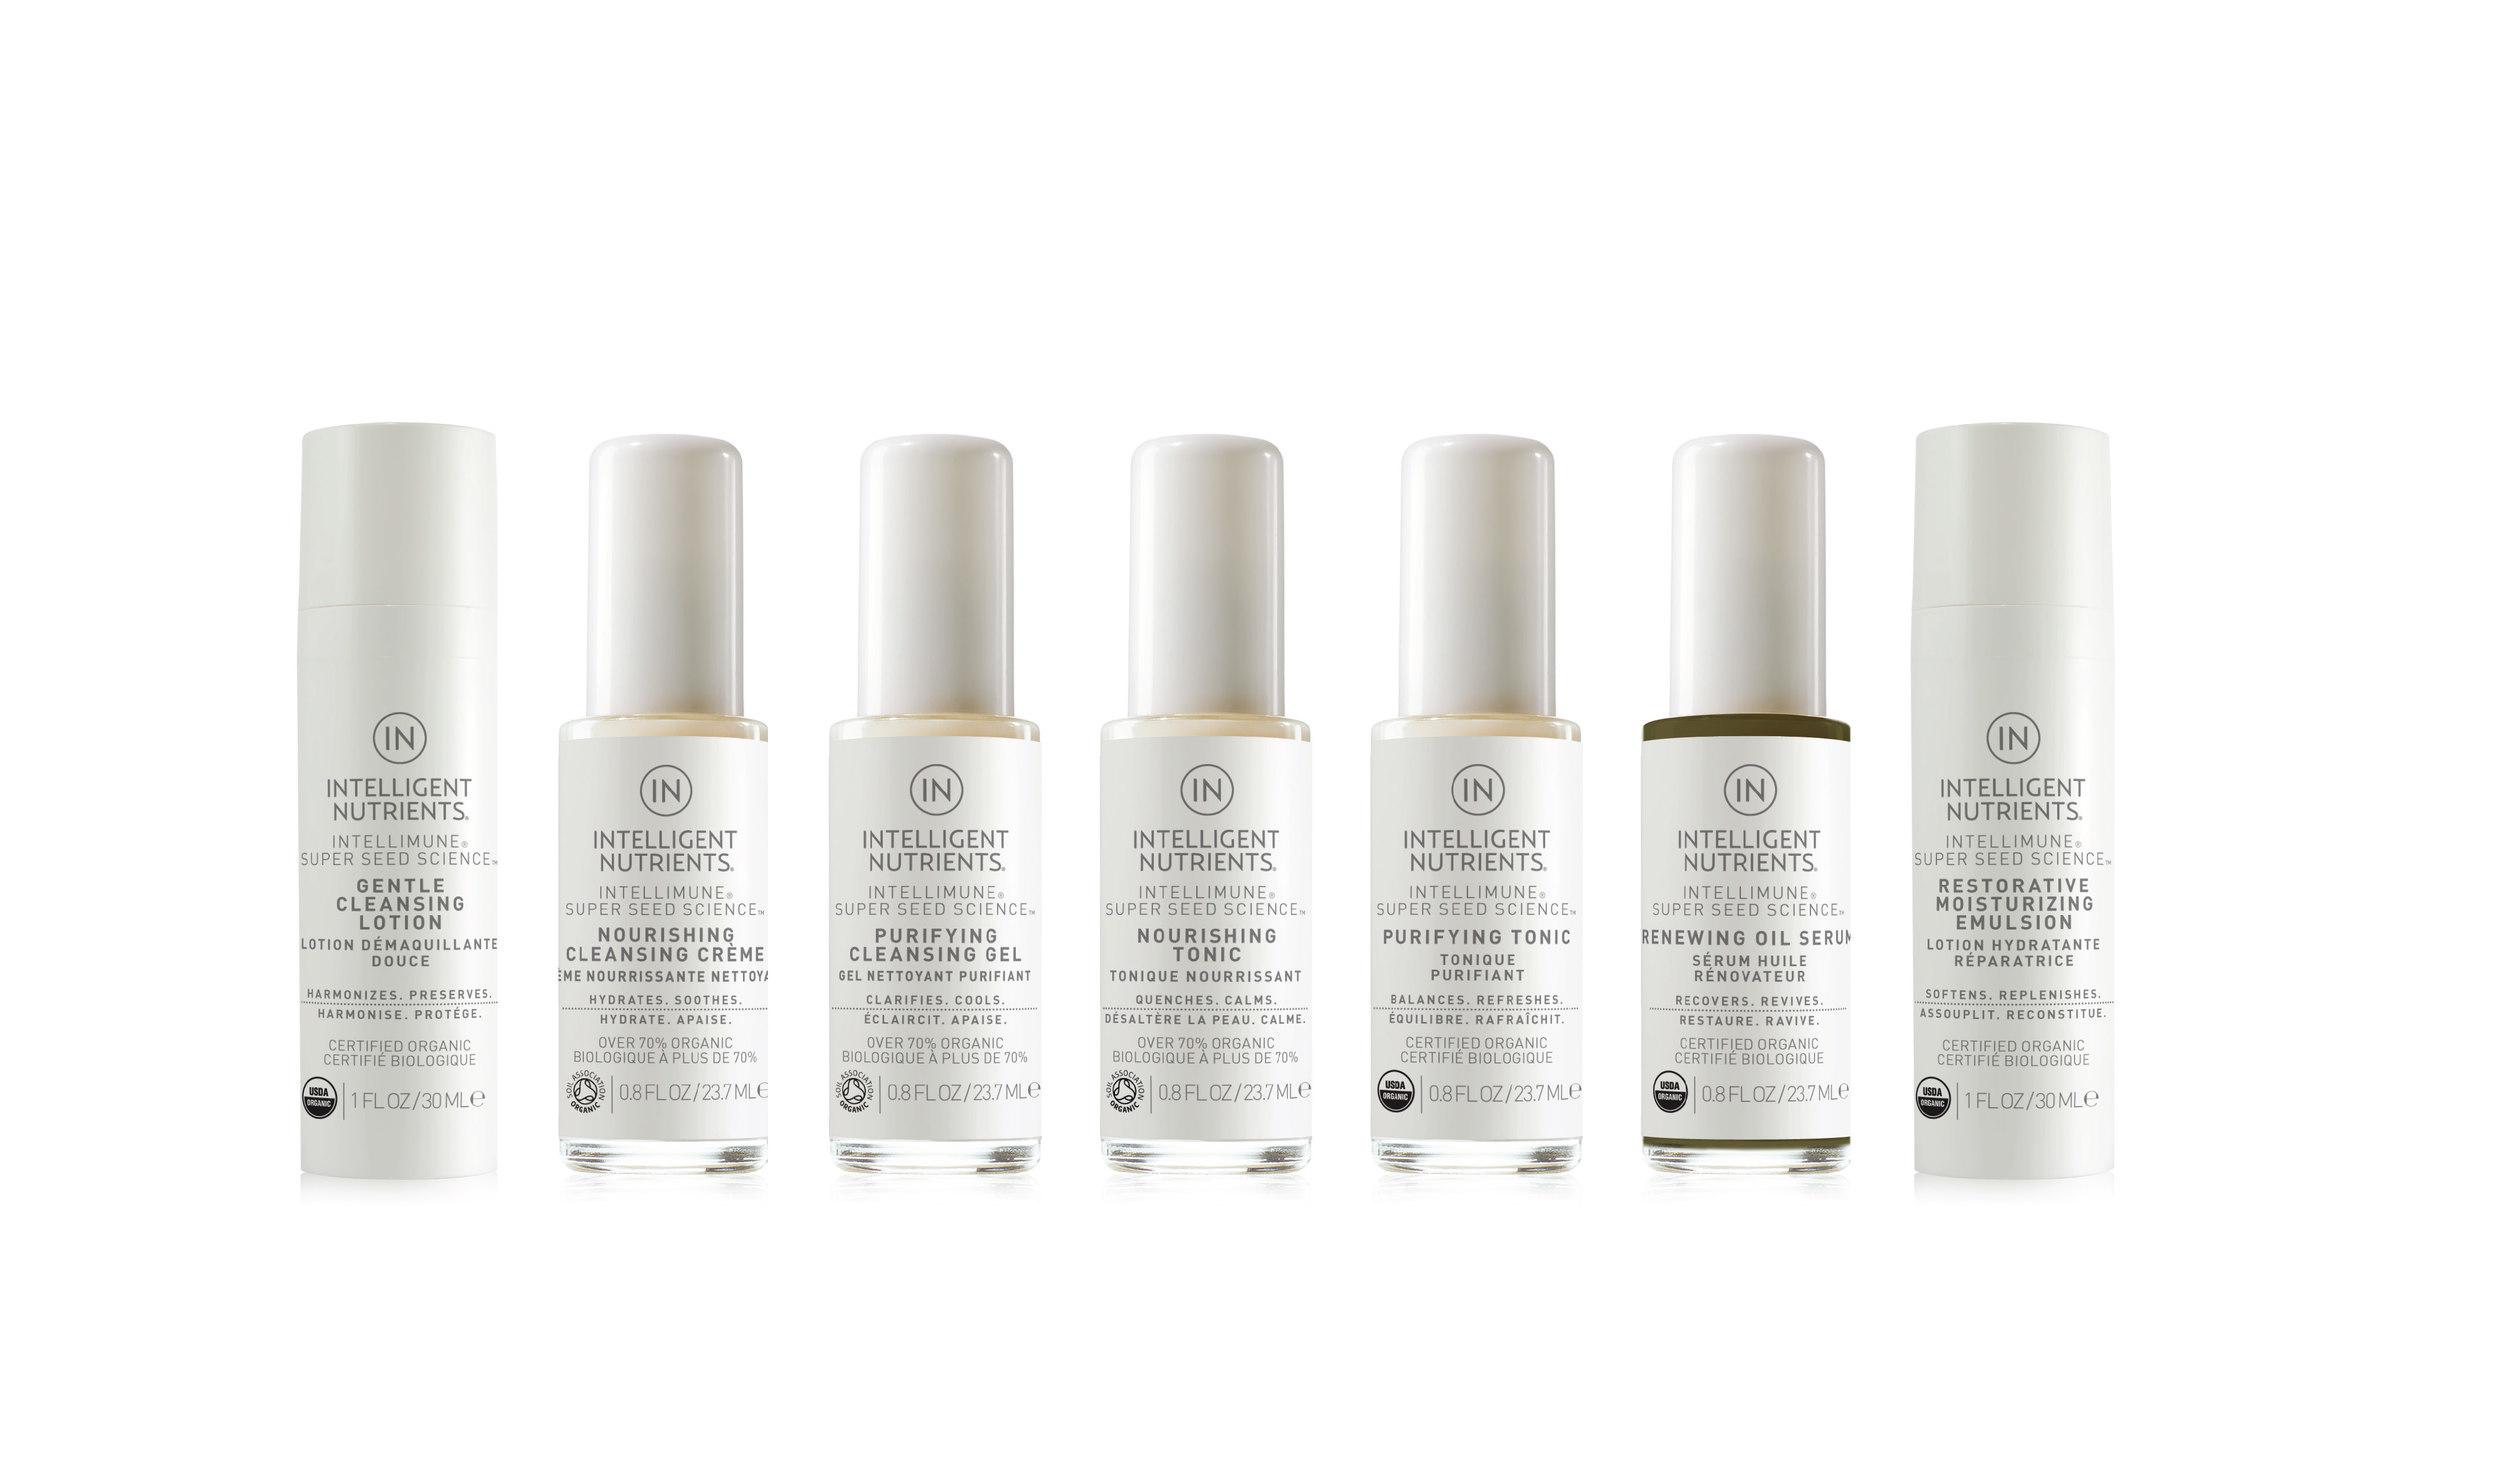 Skincare Series Travel Sizes